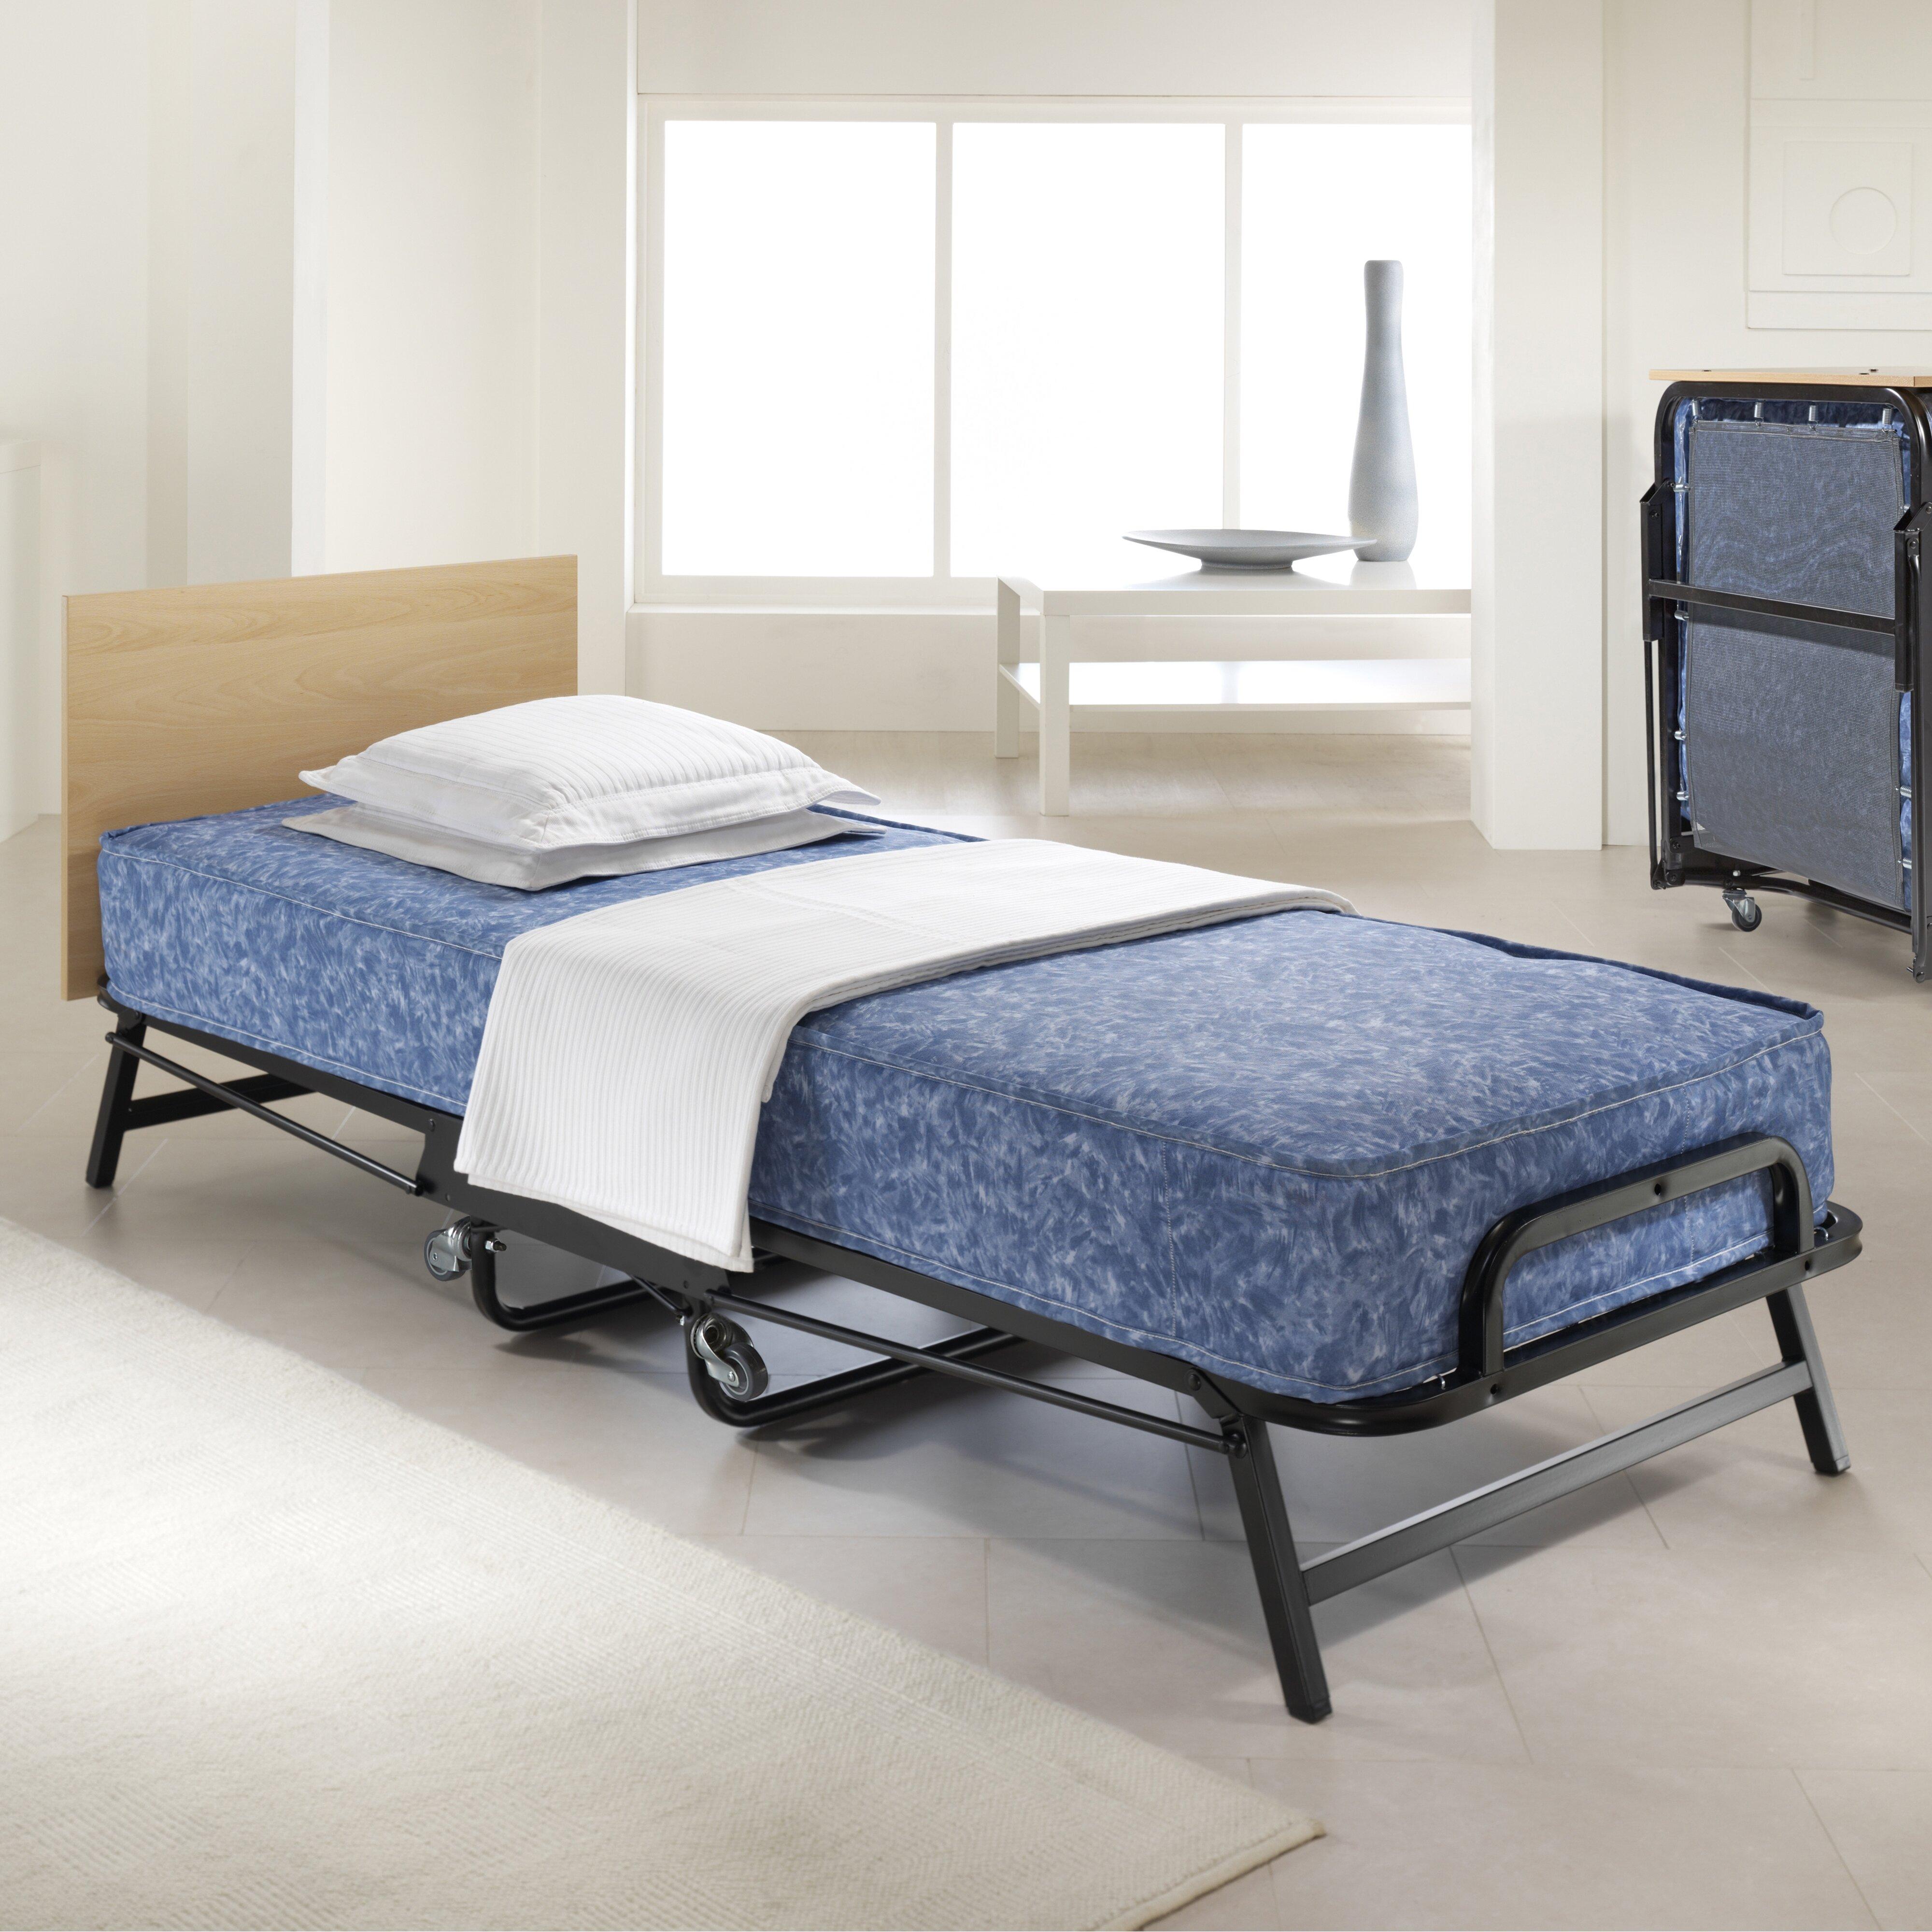 Folding Beds Reviews : Jay be crown windermere folding bed reviews wayfair uk